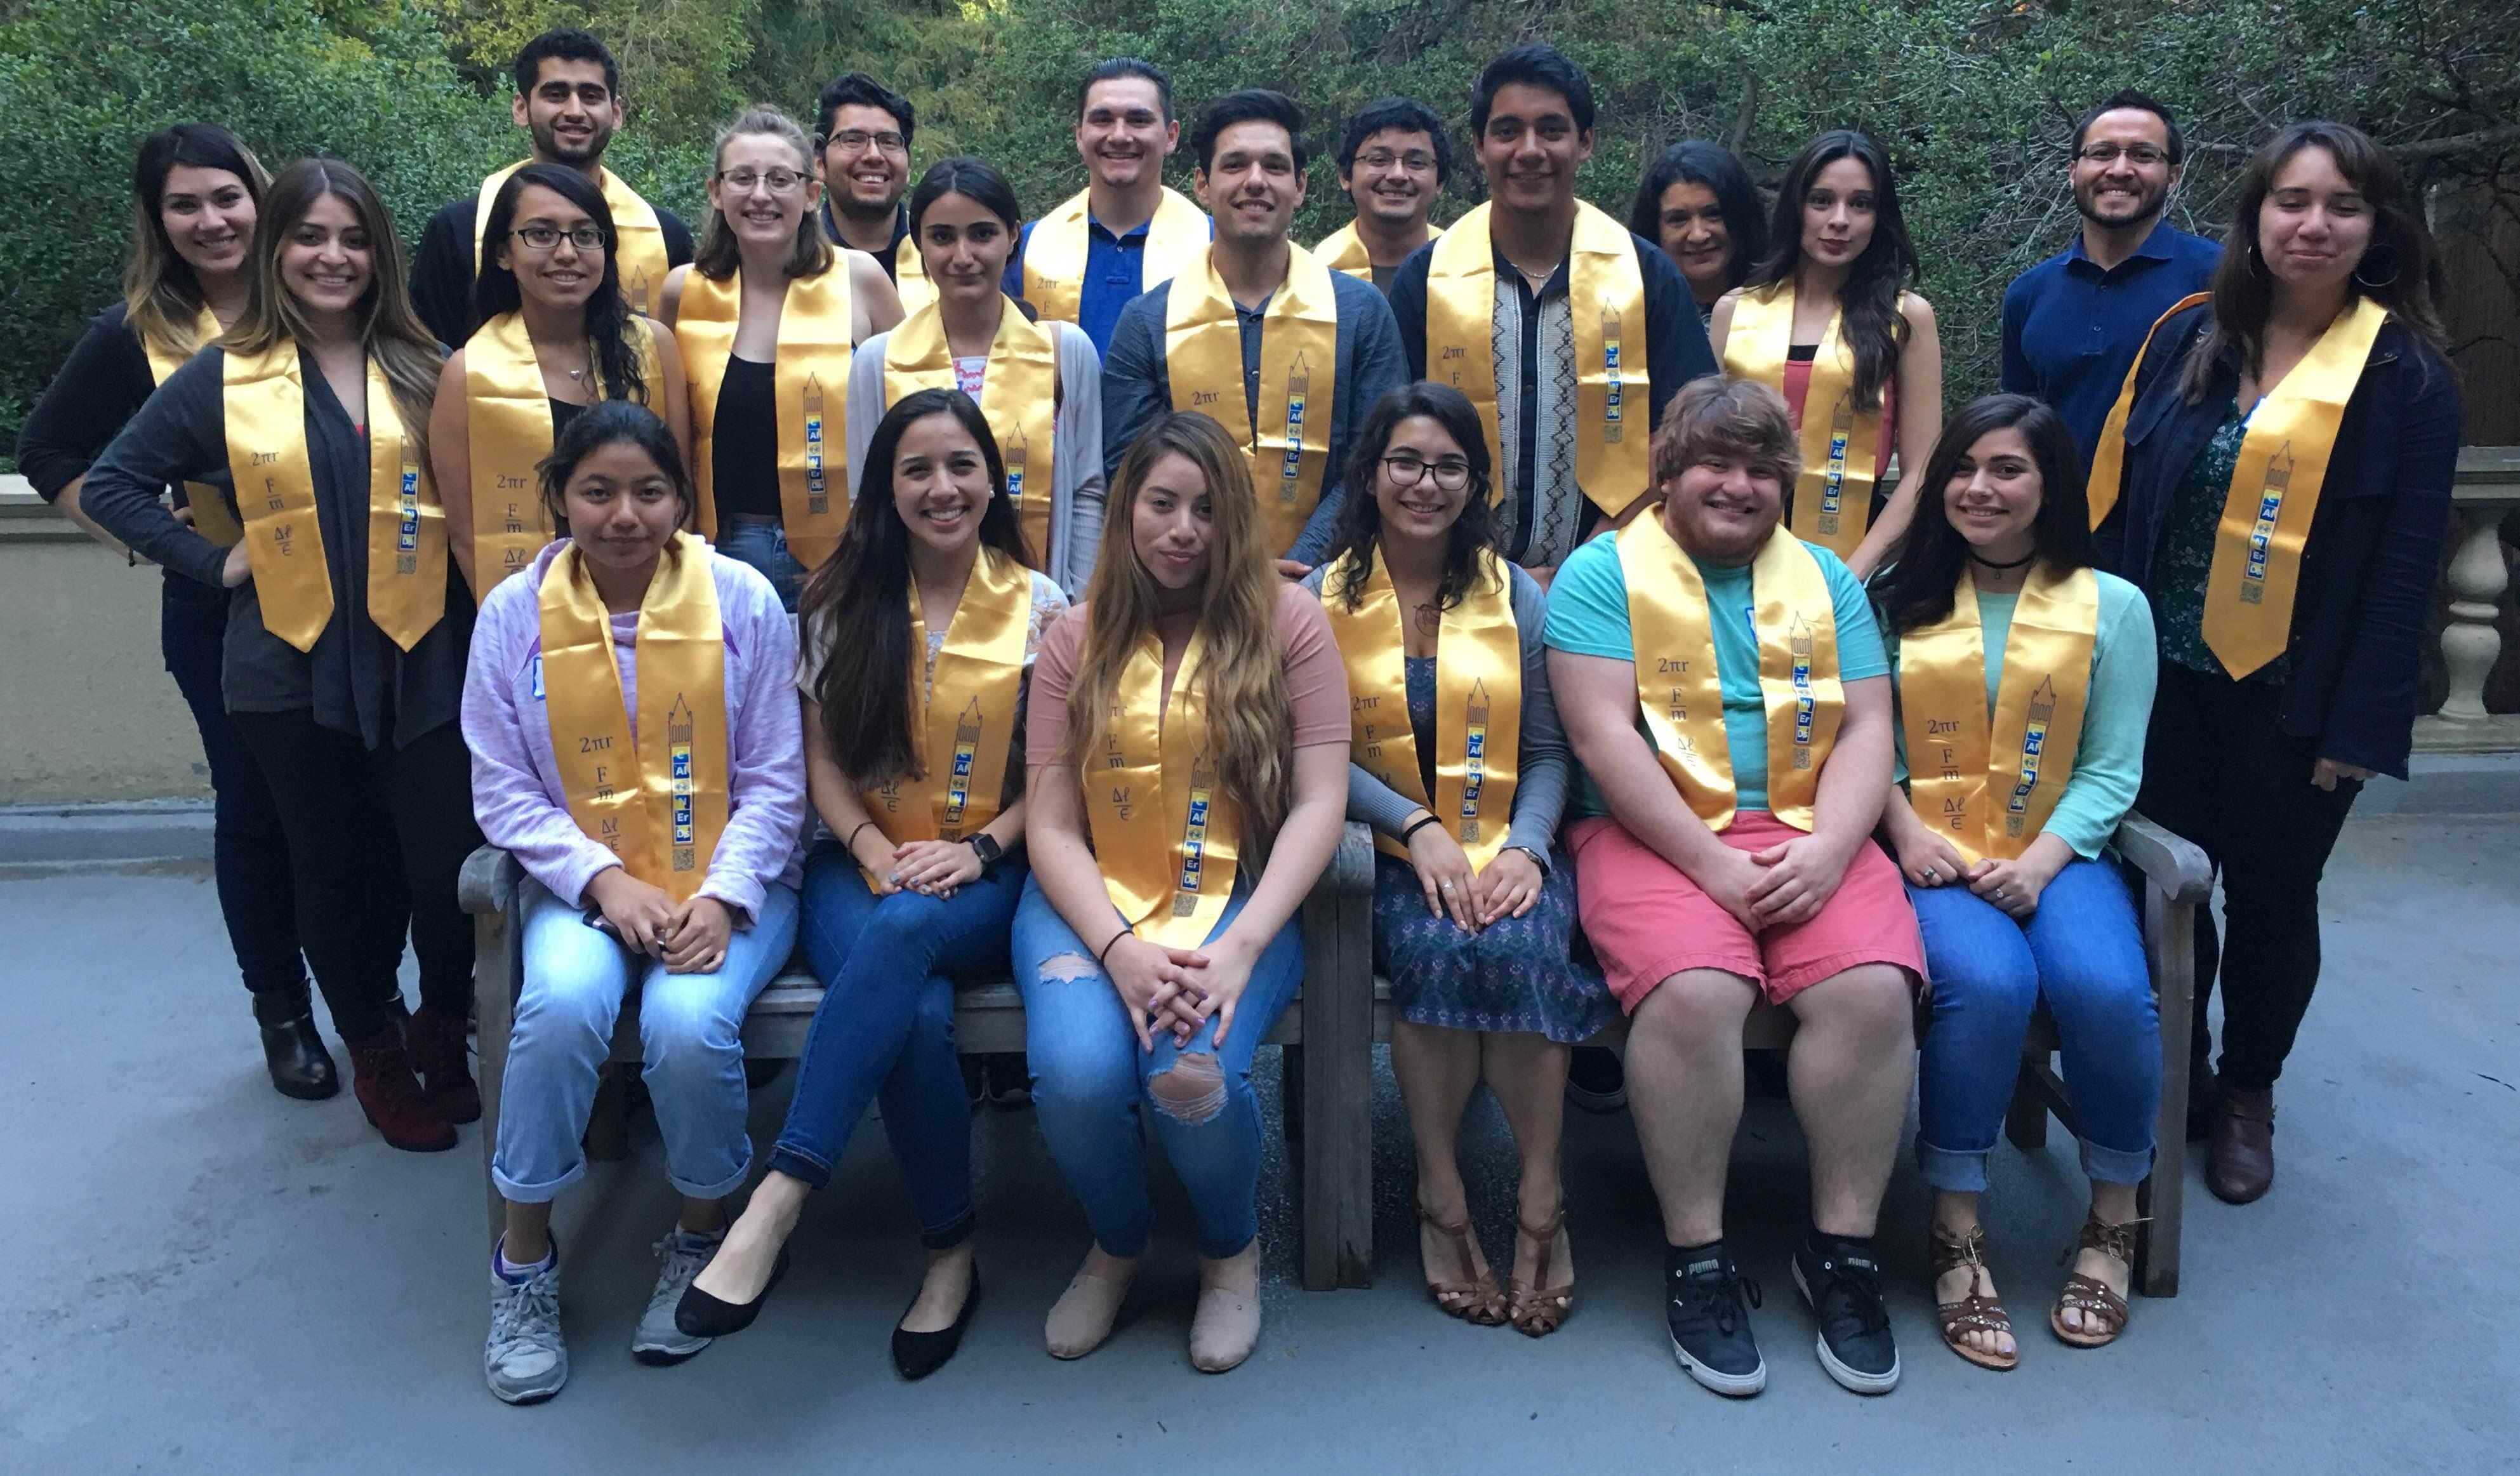 Cal NERDS 2017 Graduates